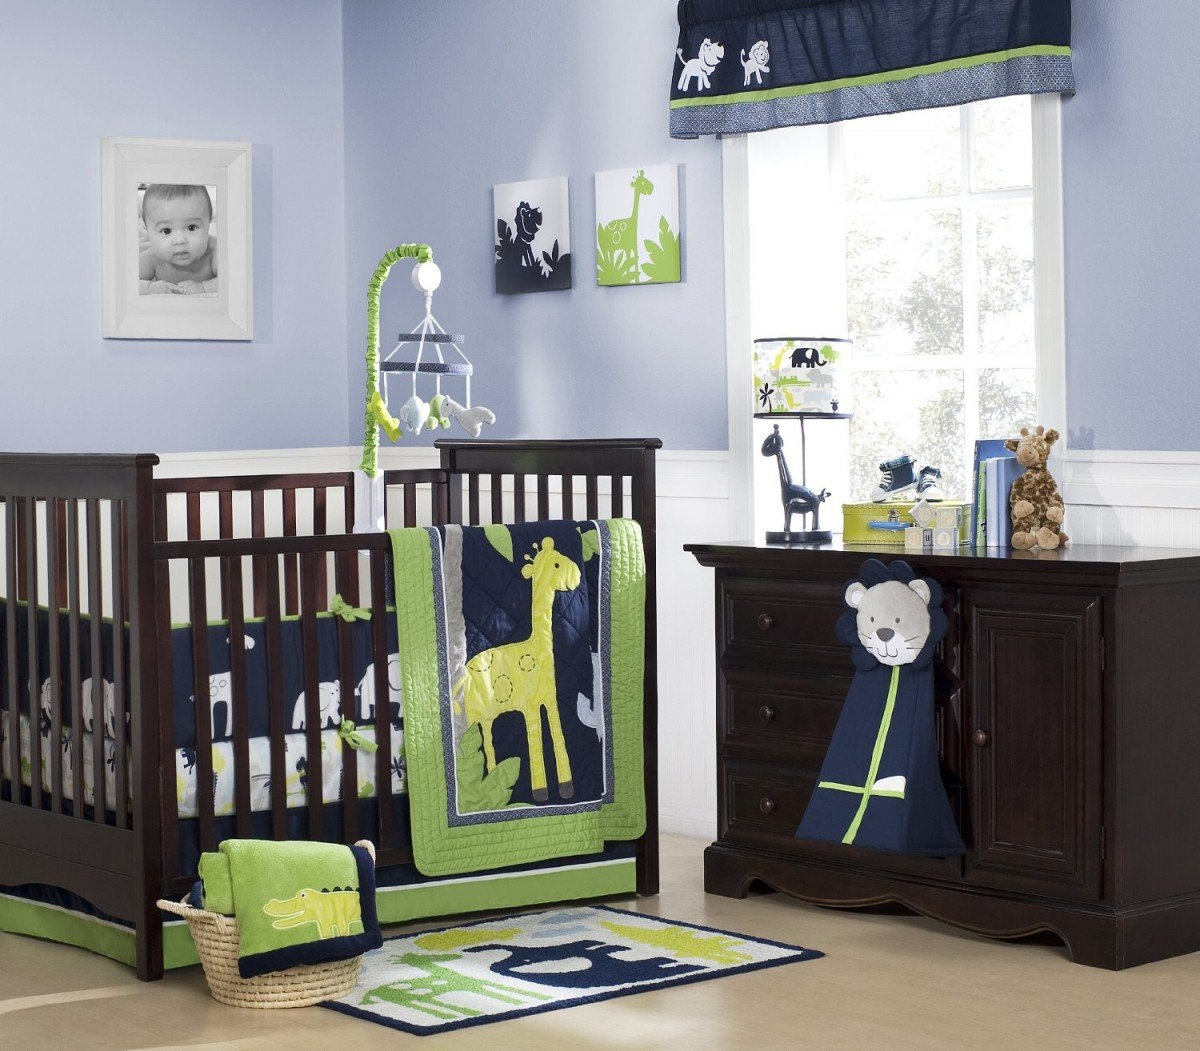 Baby Crib and Dresser Set - Home Furniture Design